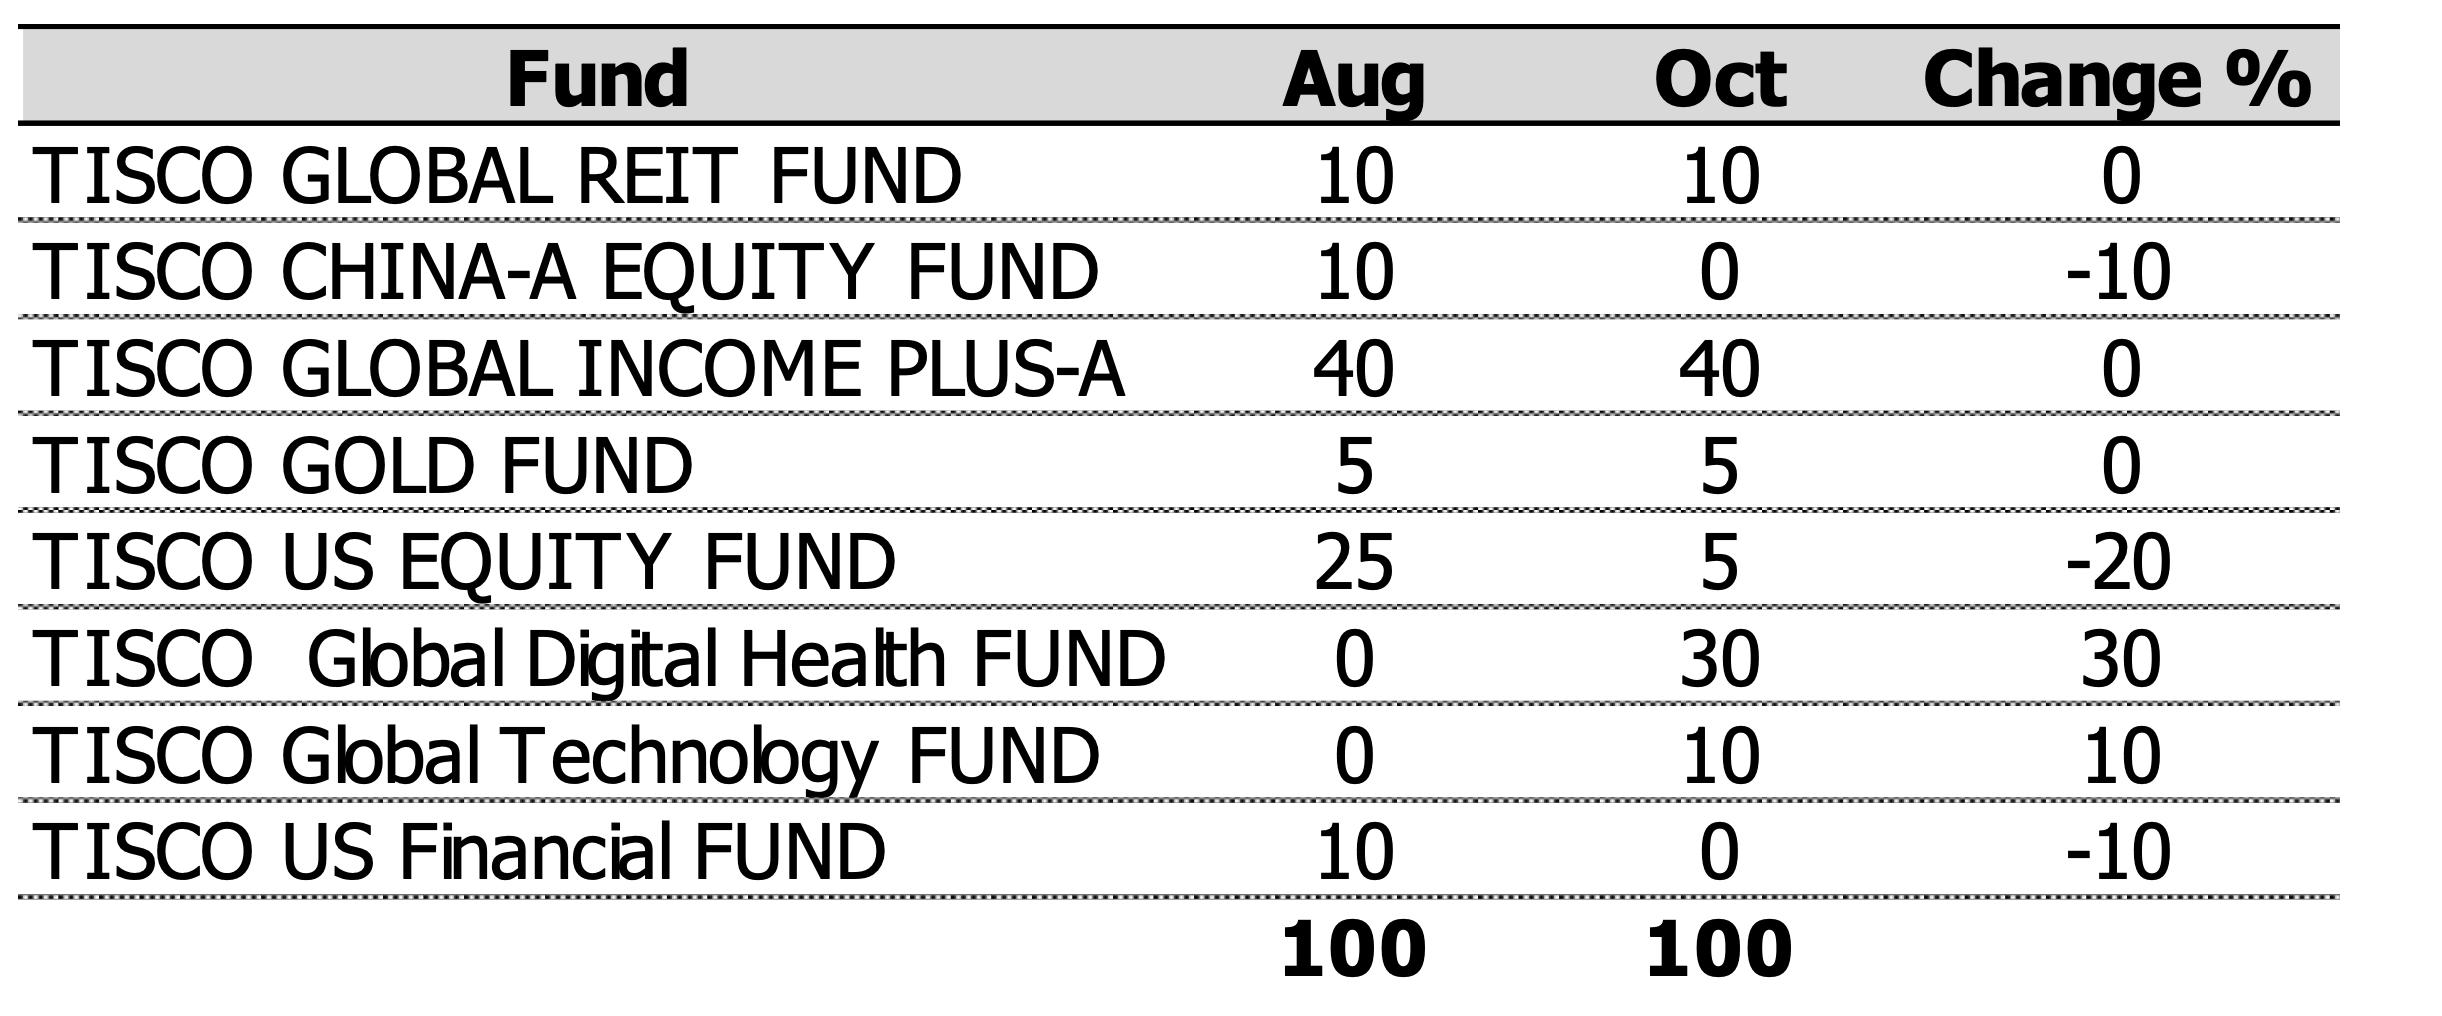 TISCO Omakase Extra Fund ปรับพอร์ตเดือน ต.ค. 2020